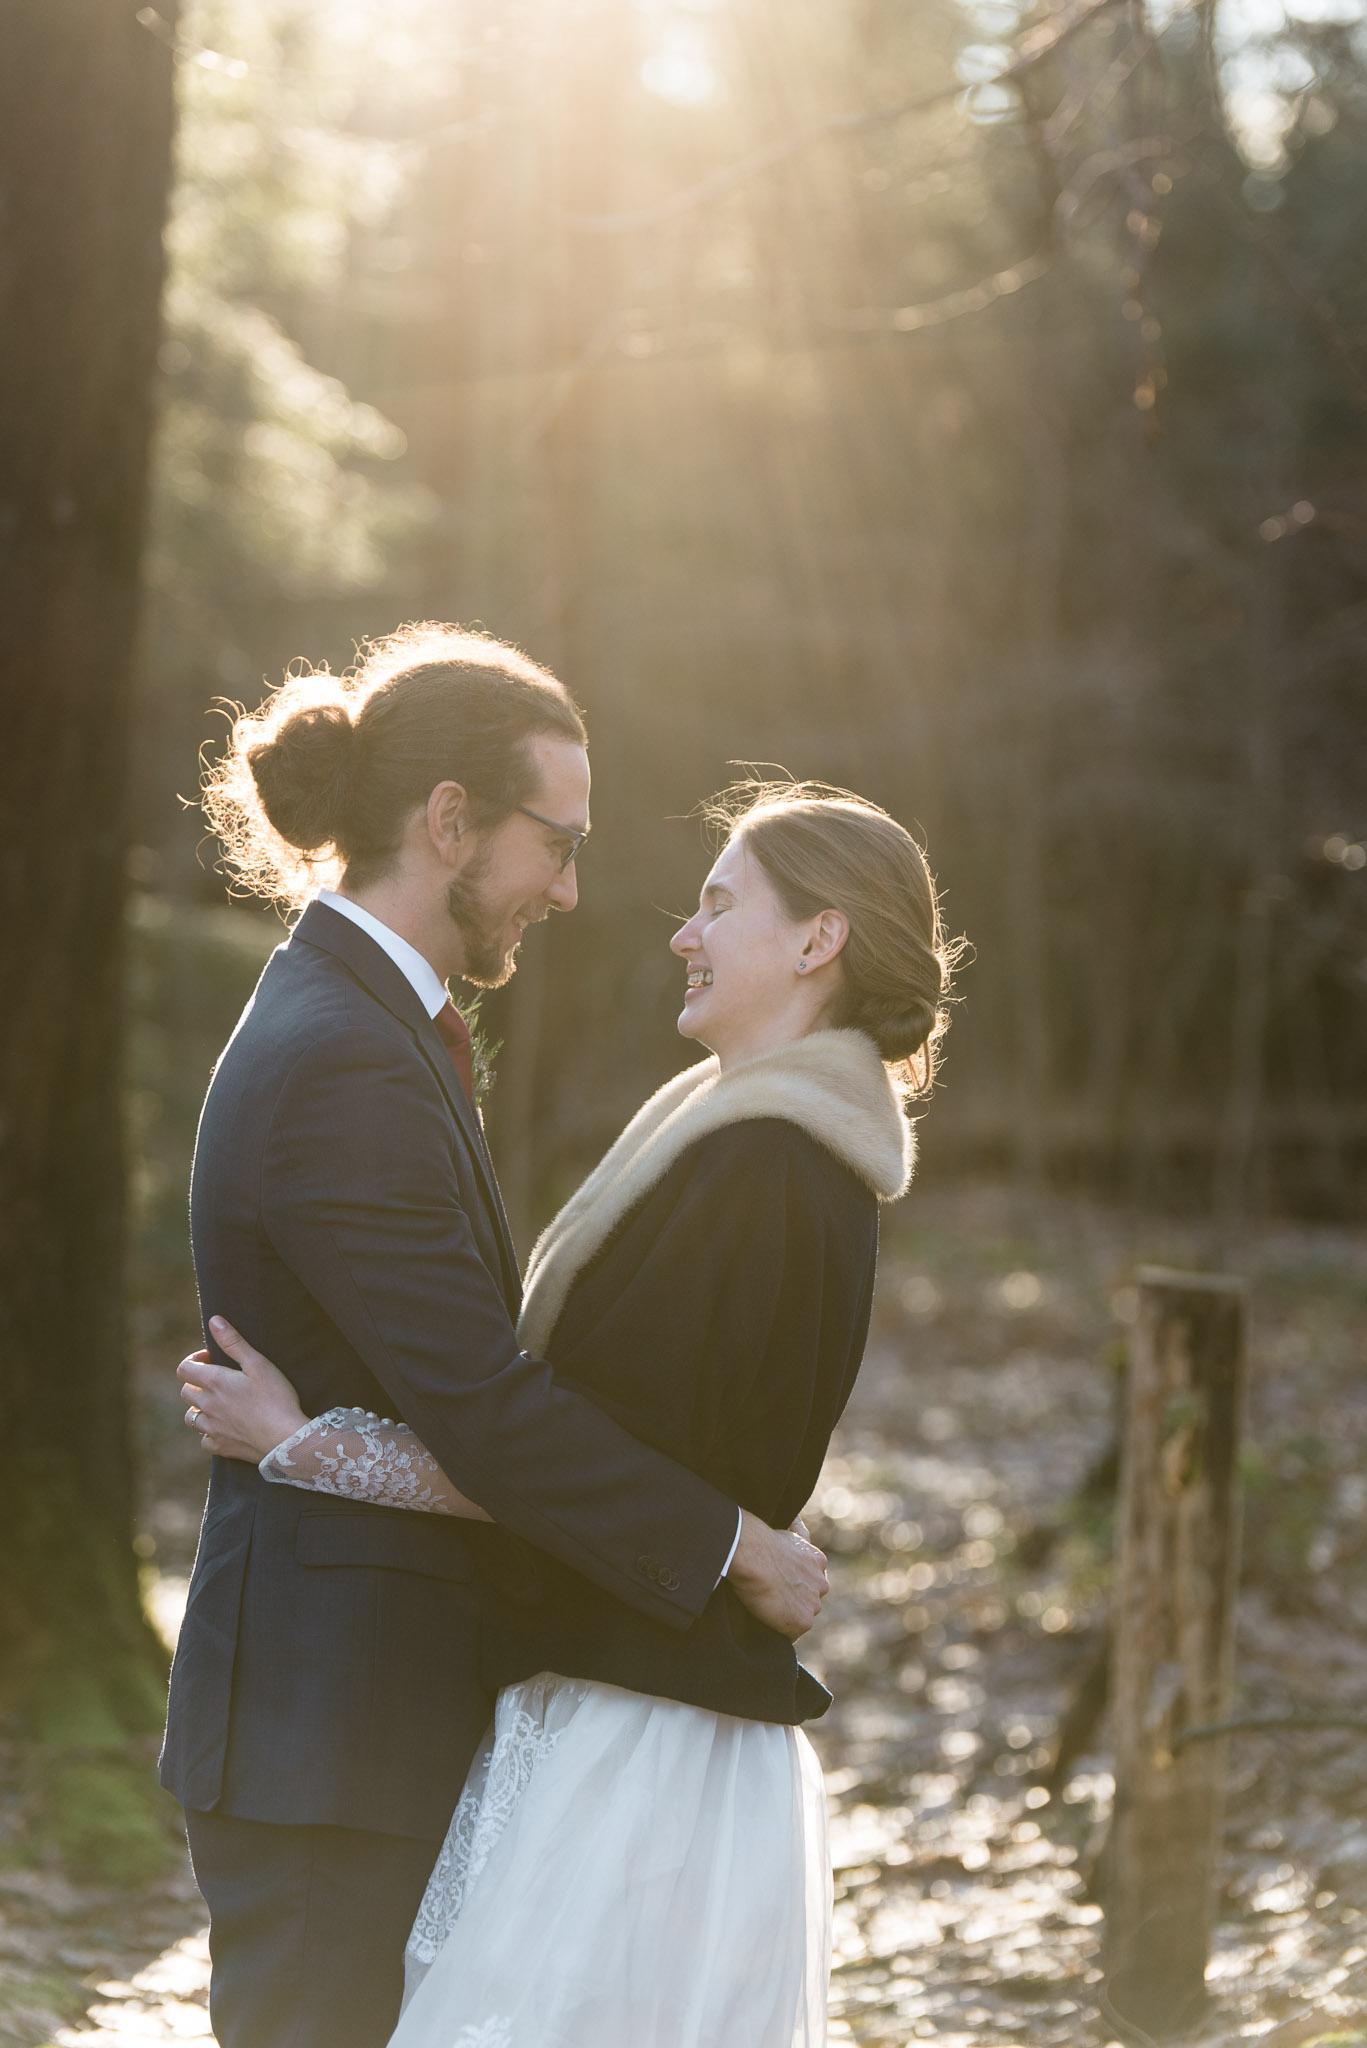 Wedding Couples portrait, Ligonier Wedding Photographer, Ligonier PA wedding, wedding potraits-8484.jpg